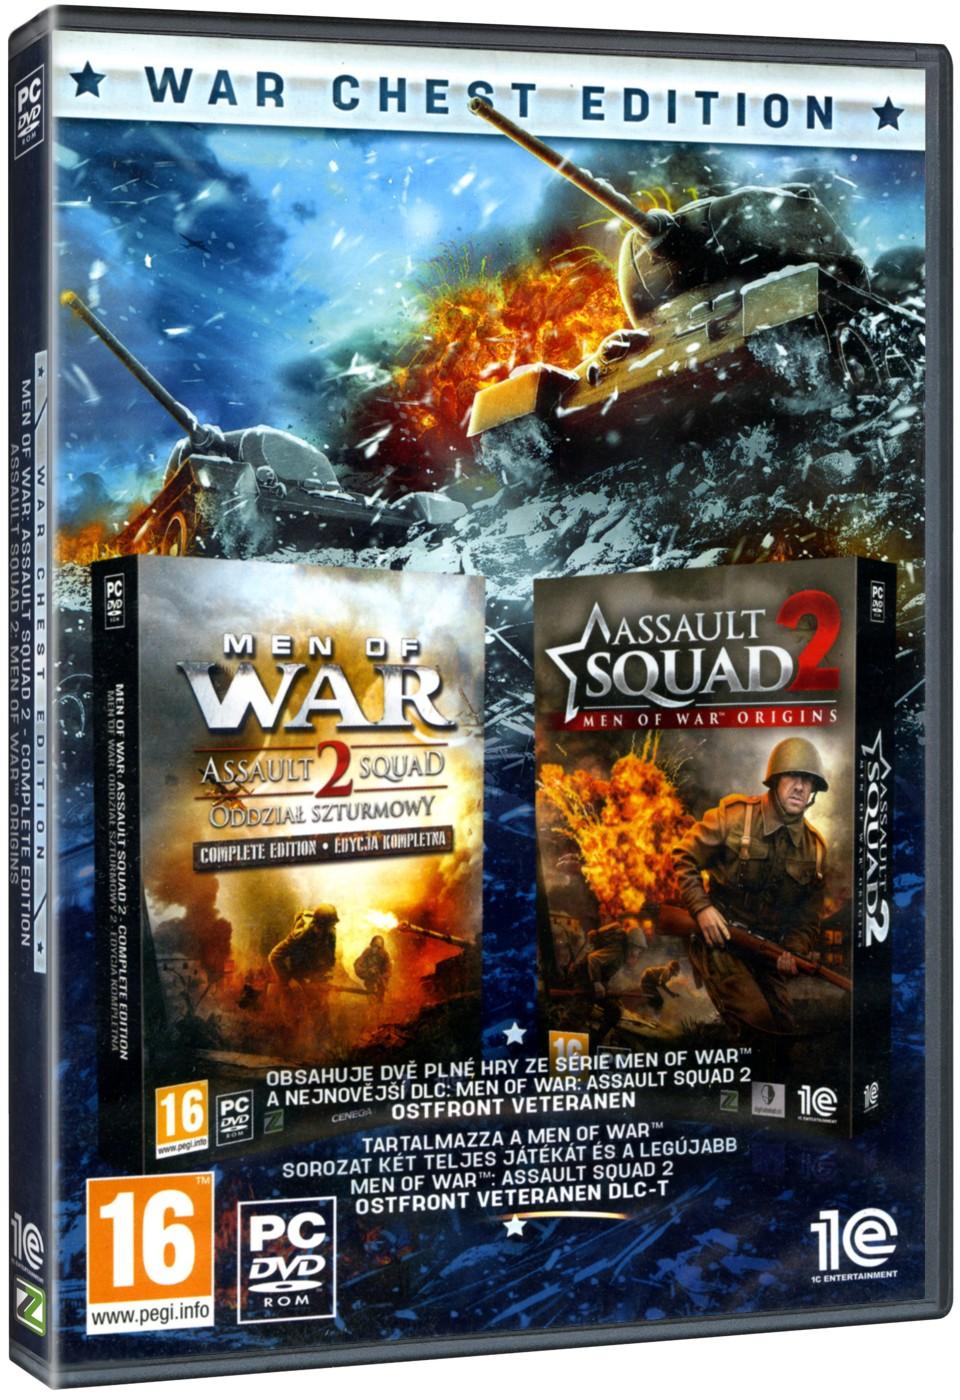 Men of War: Assault Squad 2 UE + Assault Squad 2 : Men of War Origins - PC